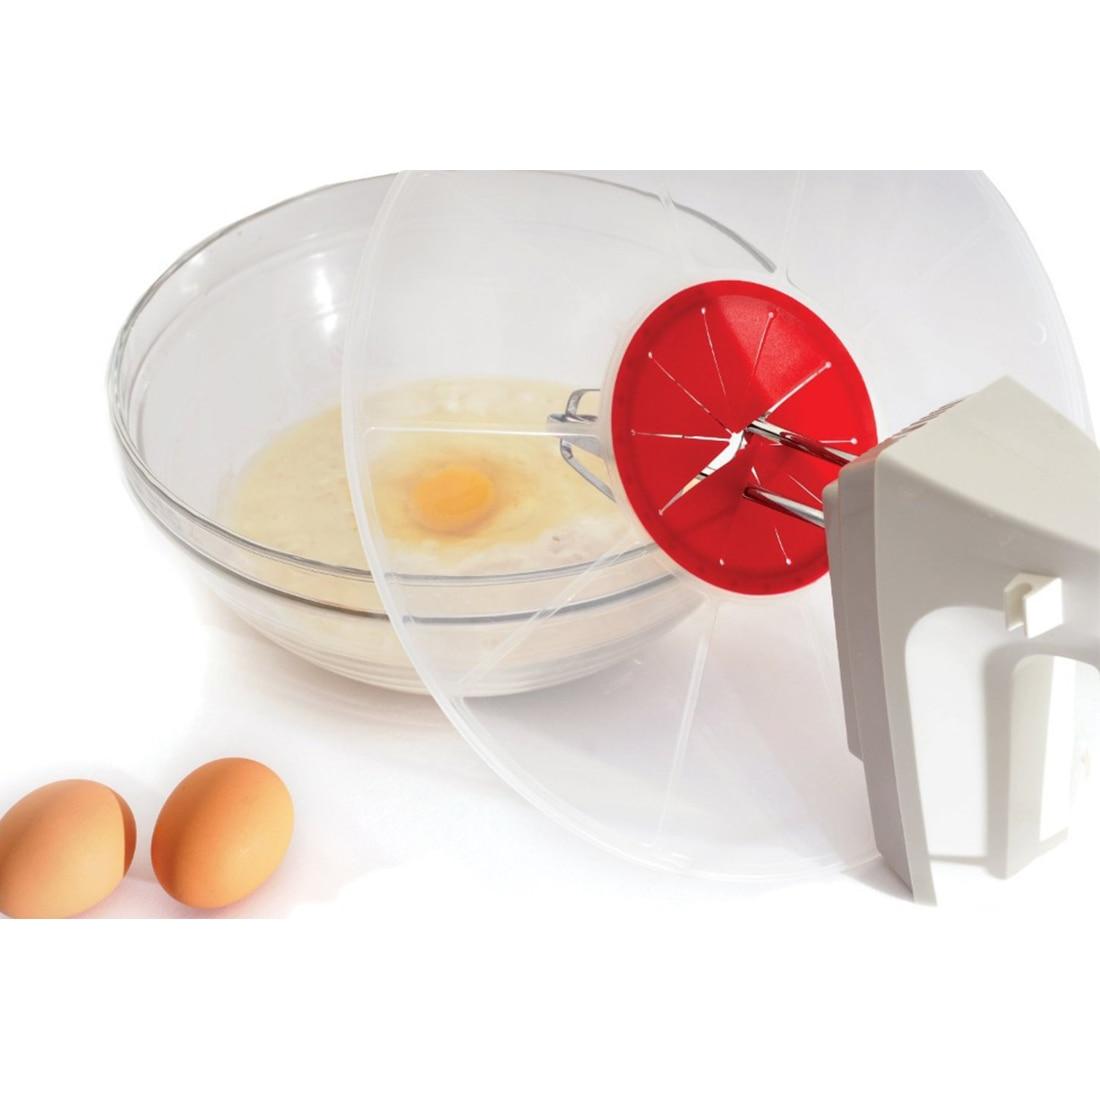 Mixing bowls Egg Bowl Whisks Screen Cover Beat Egg Cylinder Baking Splash Guard bowl lids Kitchen waterproof bowl lids